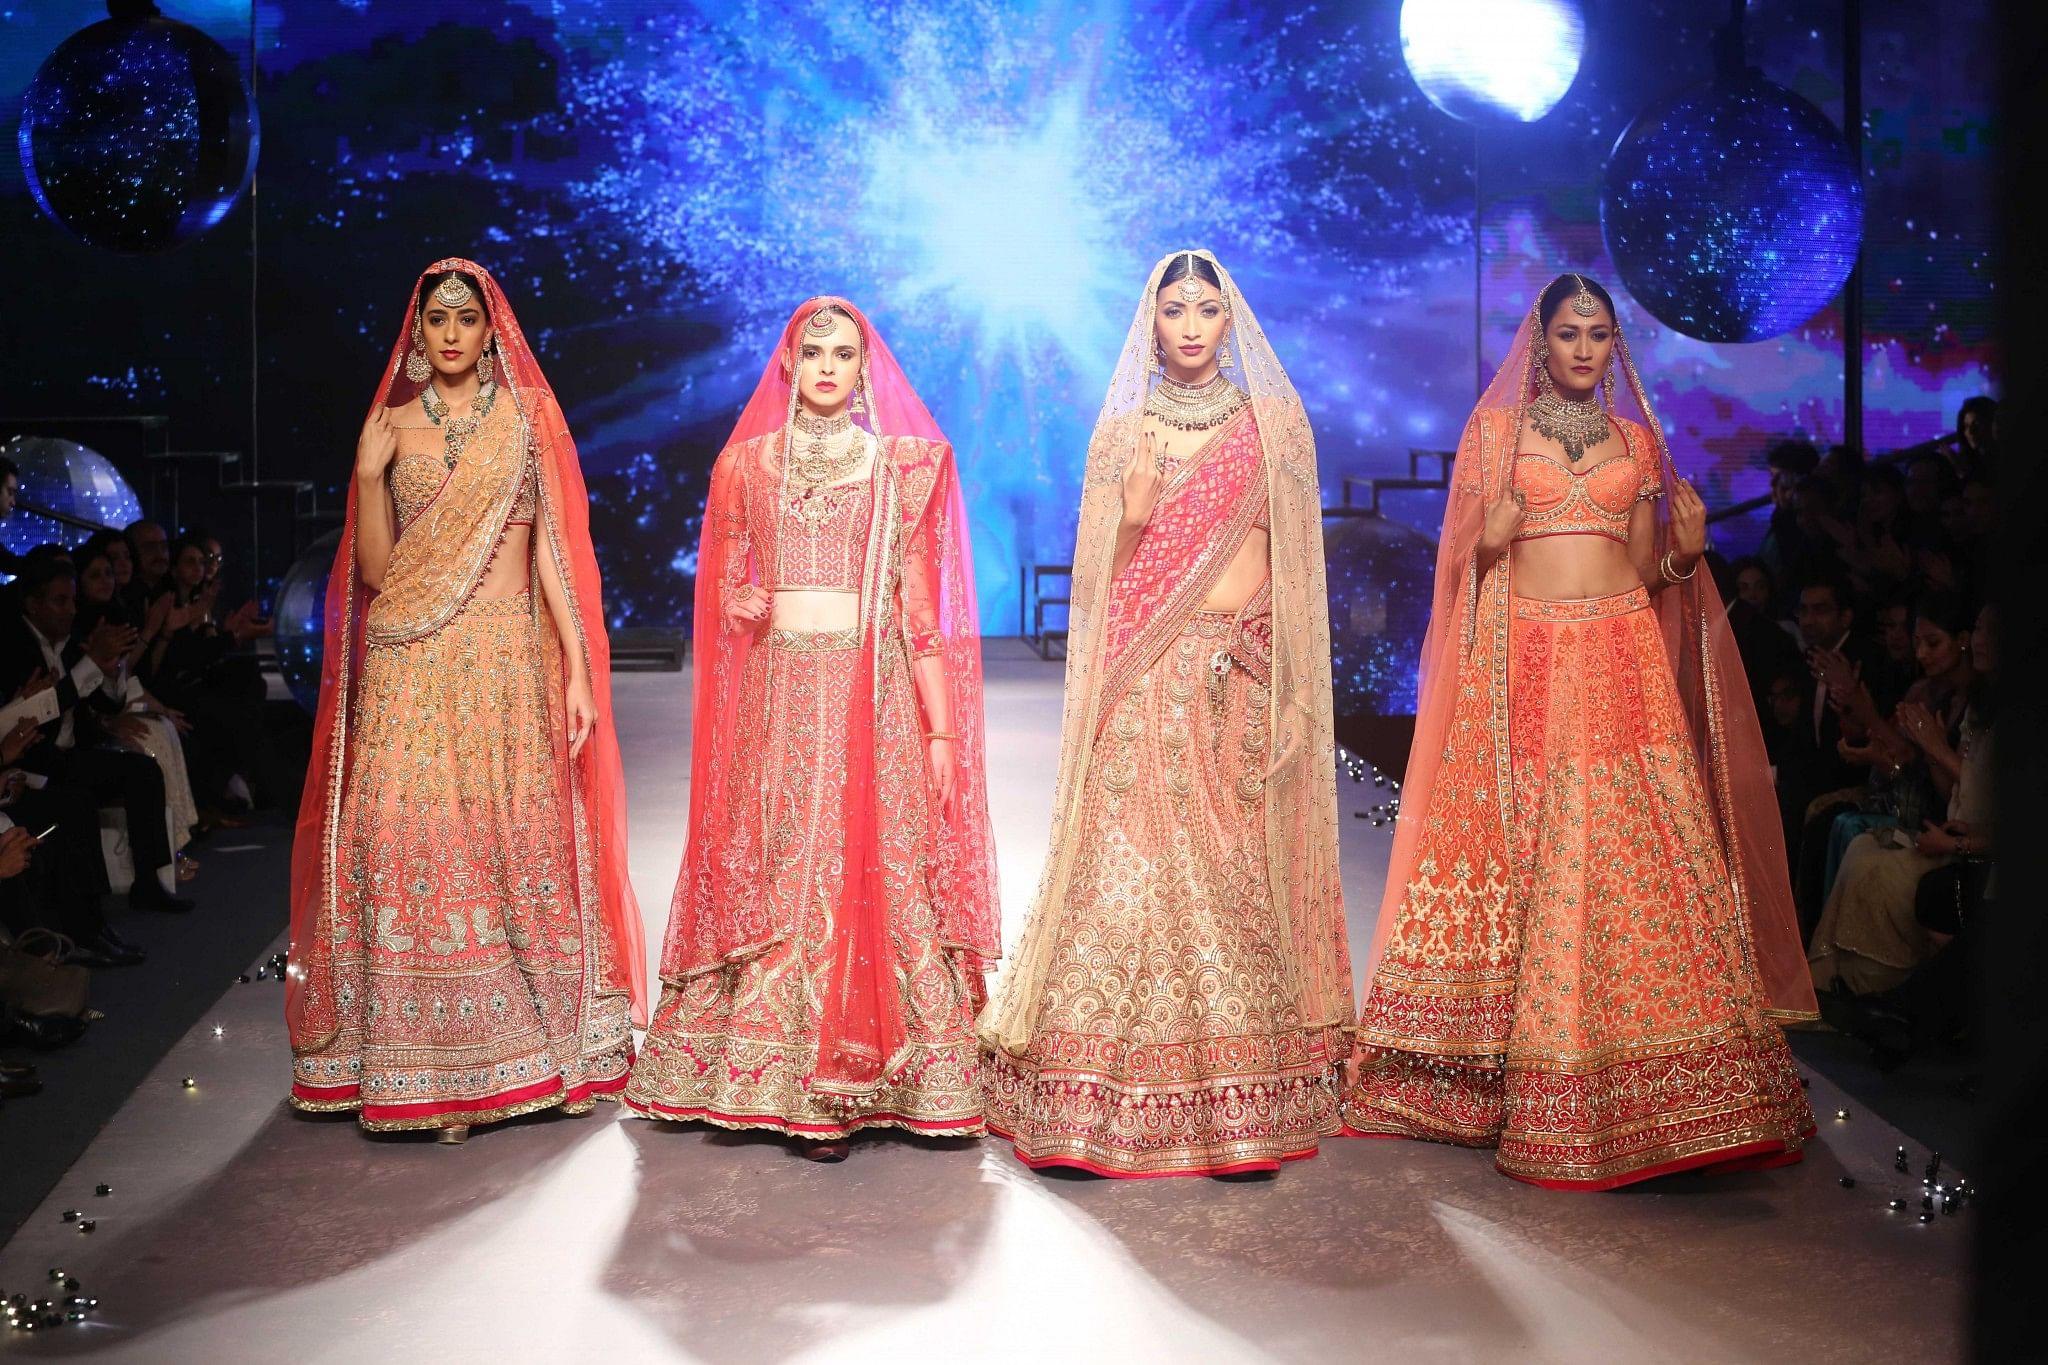 Fashion guru Tarun Tahiliani is well-known for his bridal wear and is a self-confessed aficionado of the Kanjivaram and Banarasi weaves. (Courtesy Tarun Tahiliani)